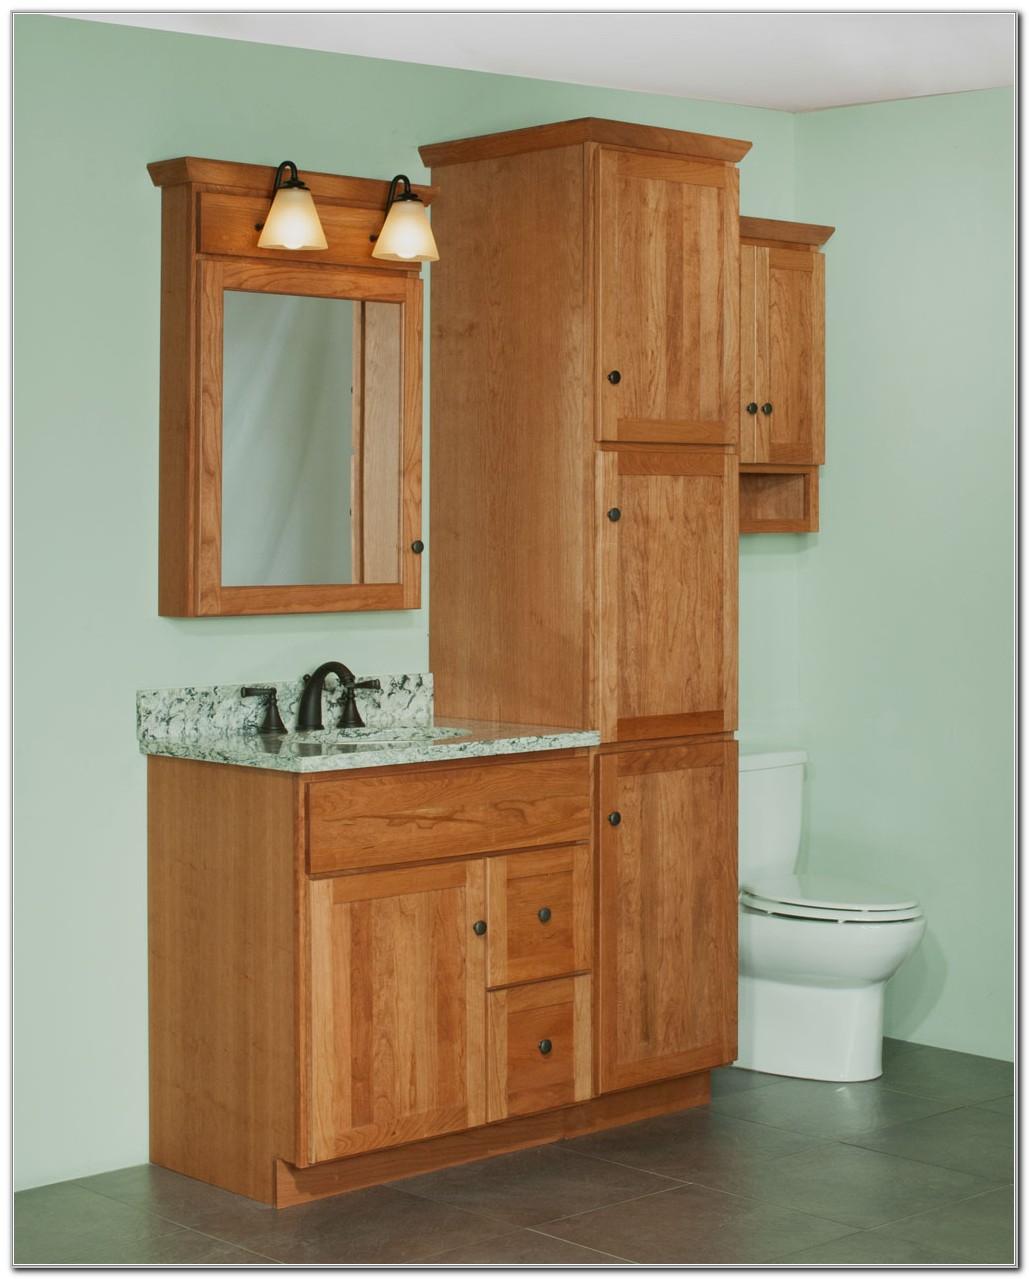 Popular Bathroom Vanity And Linen Cabinet Sets bathroom vanity and linen cabinet sets